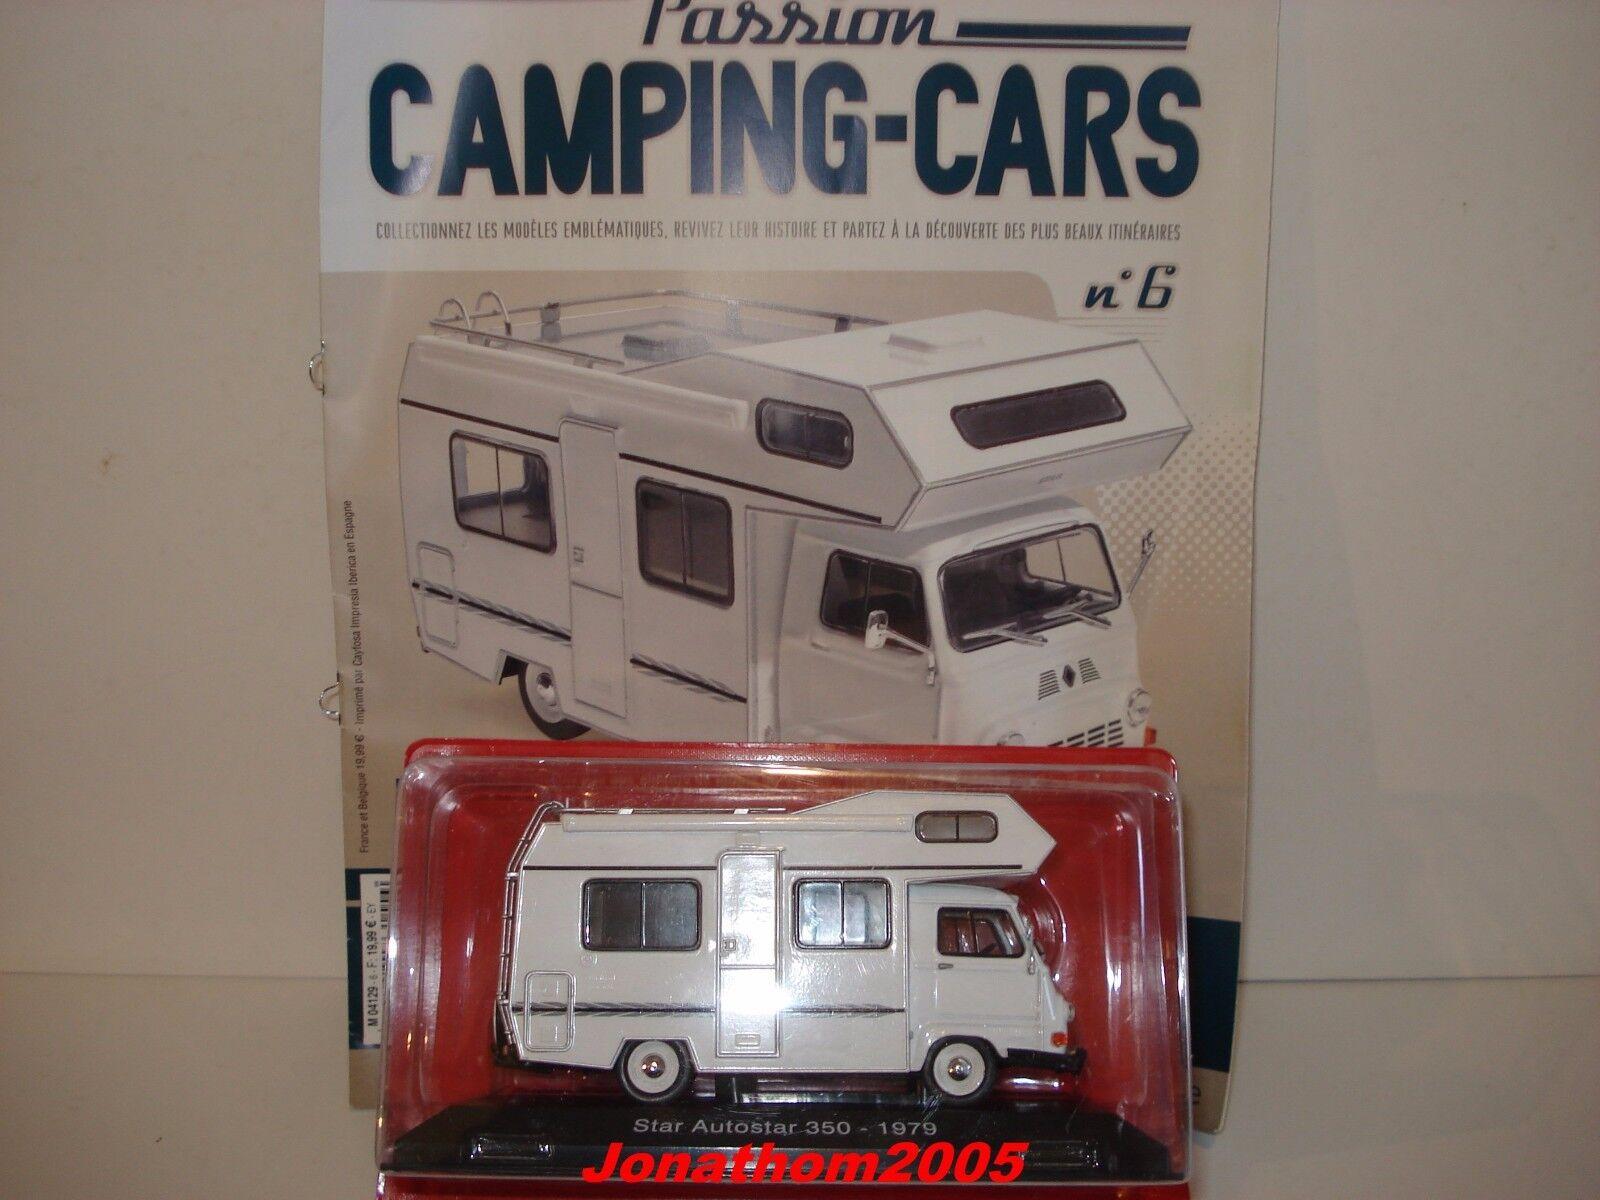 PASSION CAMPING CARS - AUTOSTAR 350 RENAULT C COURIER - FRANCE 1979 au 1 43°